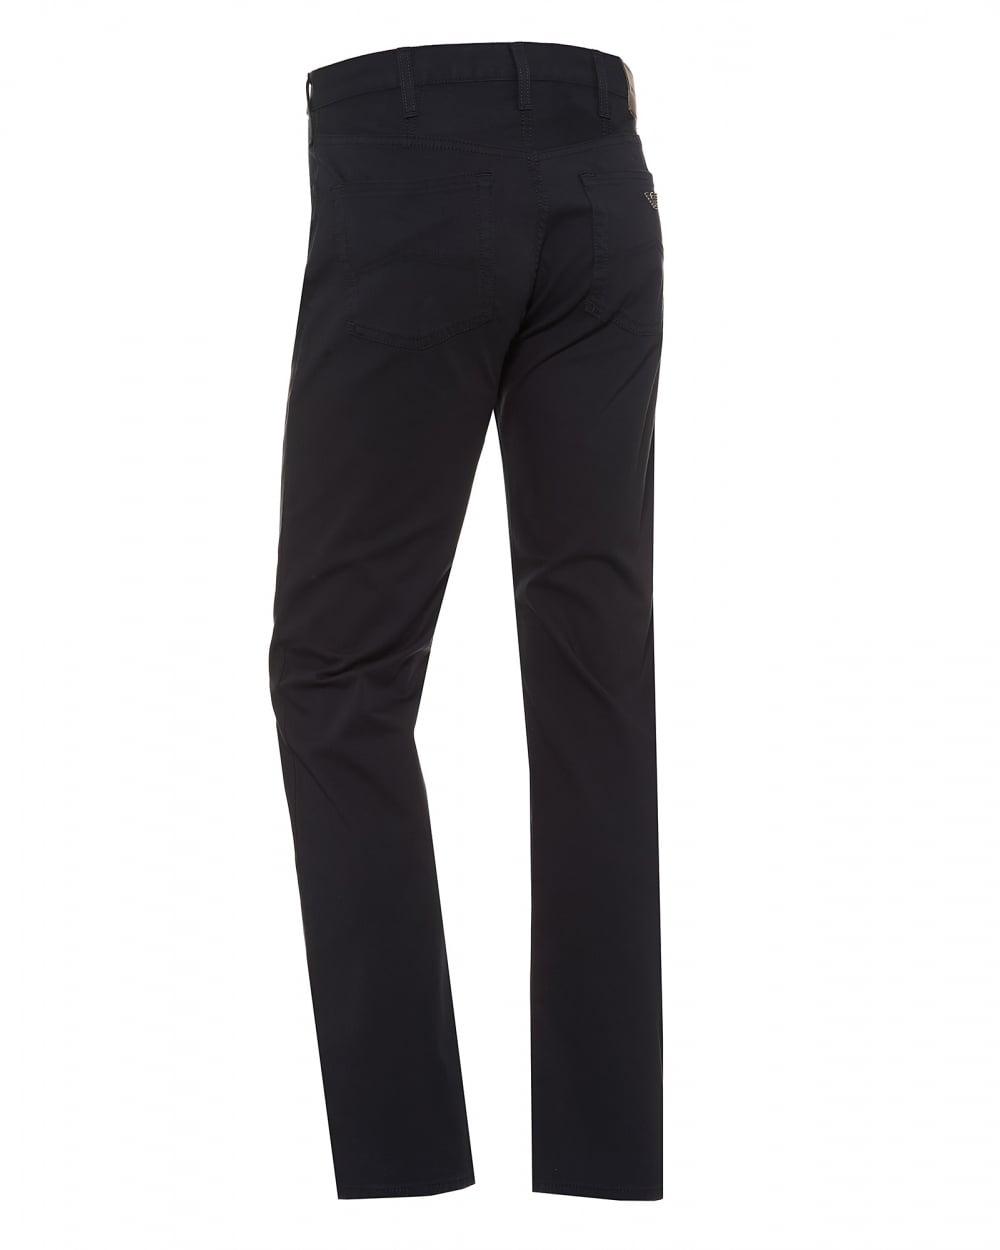 76d3a730835a Emporio Armani Mens J21 Comfort Stretch Gab Navy Regular Fit Jeans